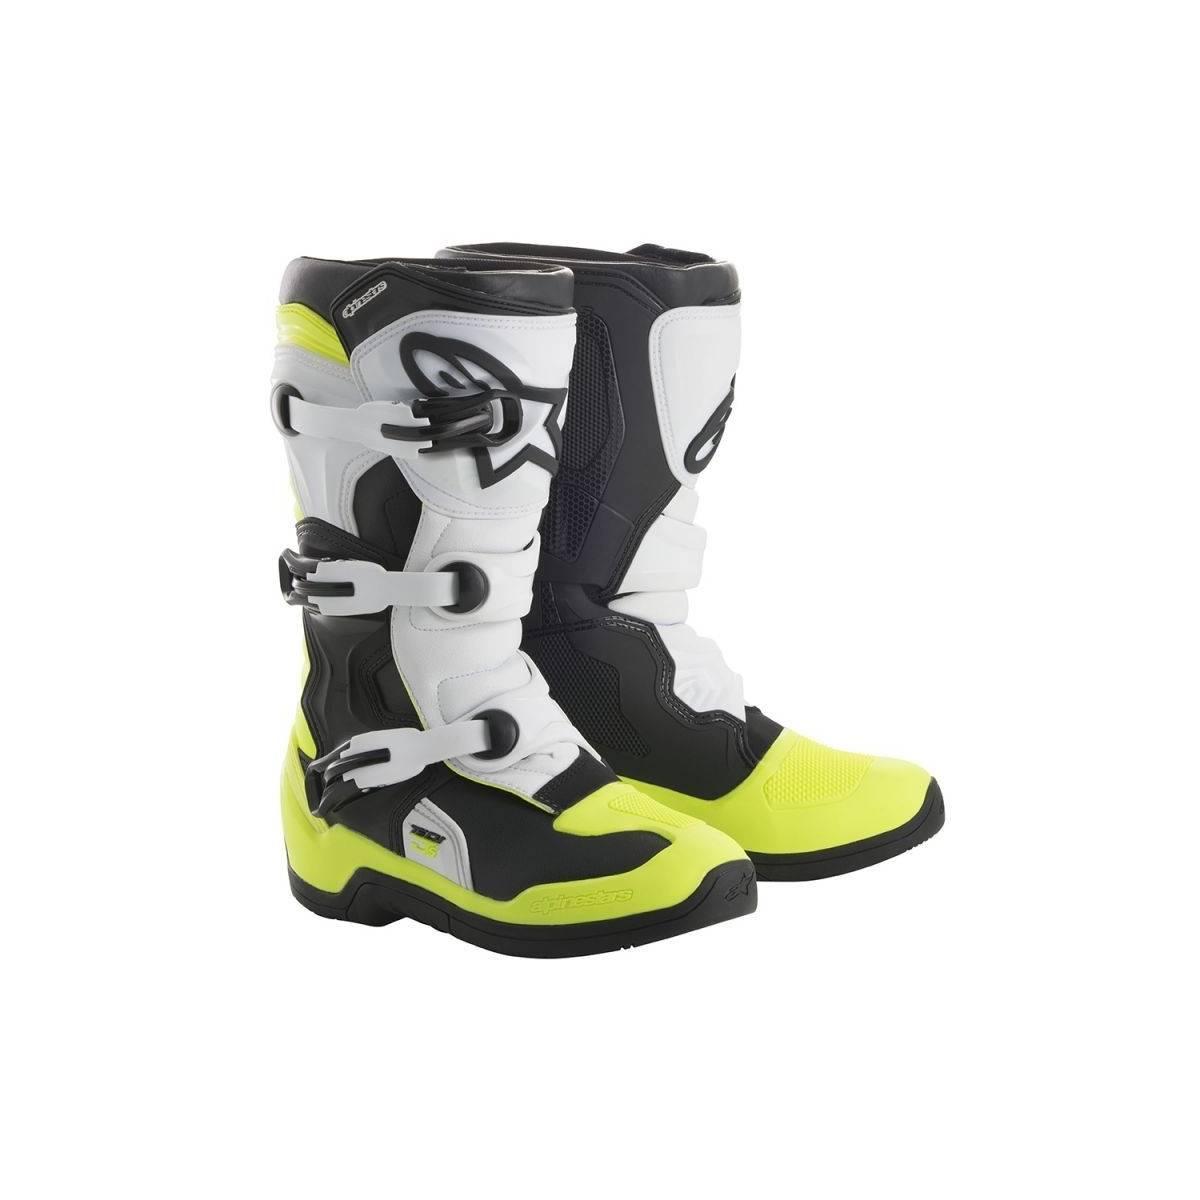 2014018-125 - Botas Alpinestars Tech3S Junior Negra Blanca Amarillo Flãºor